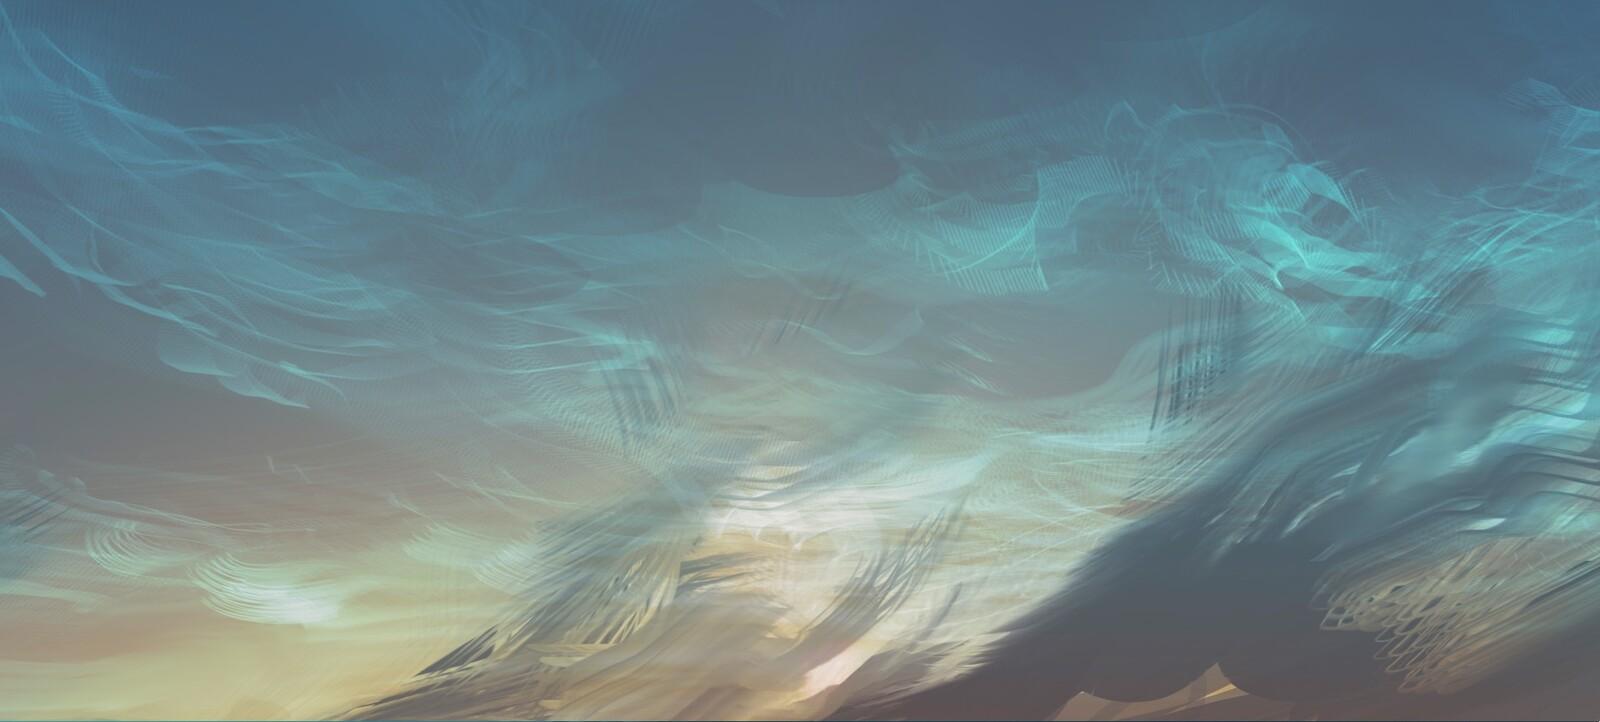 just below horizon - detail4 noctilucent clouds